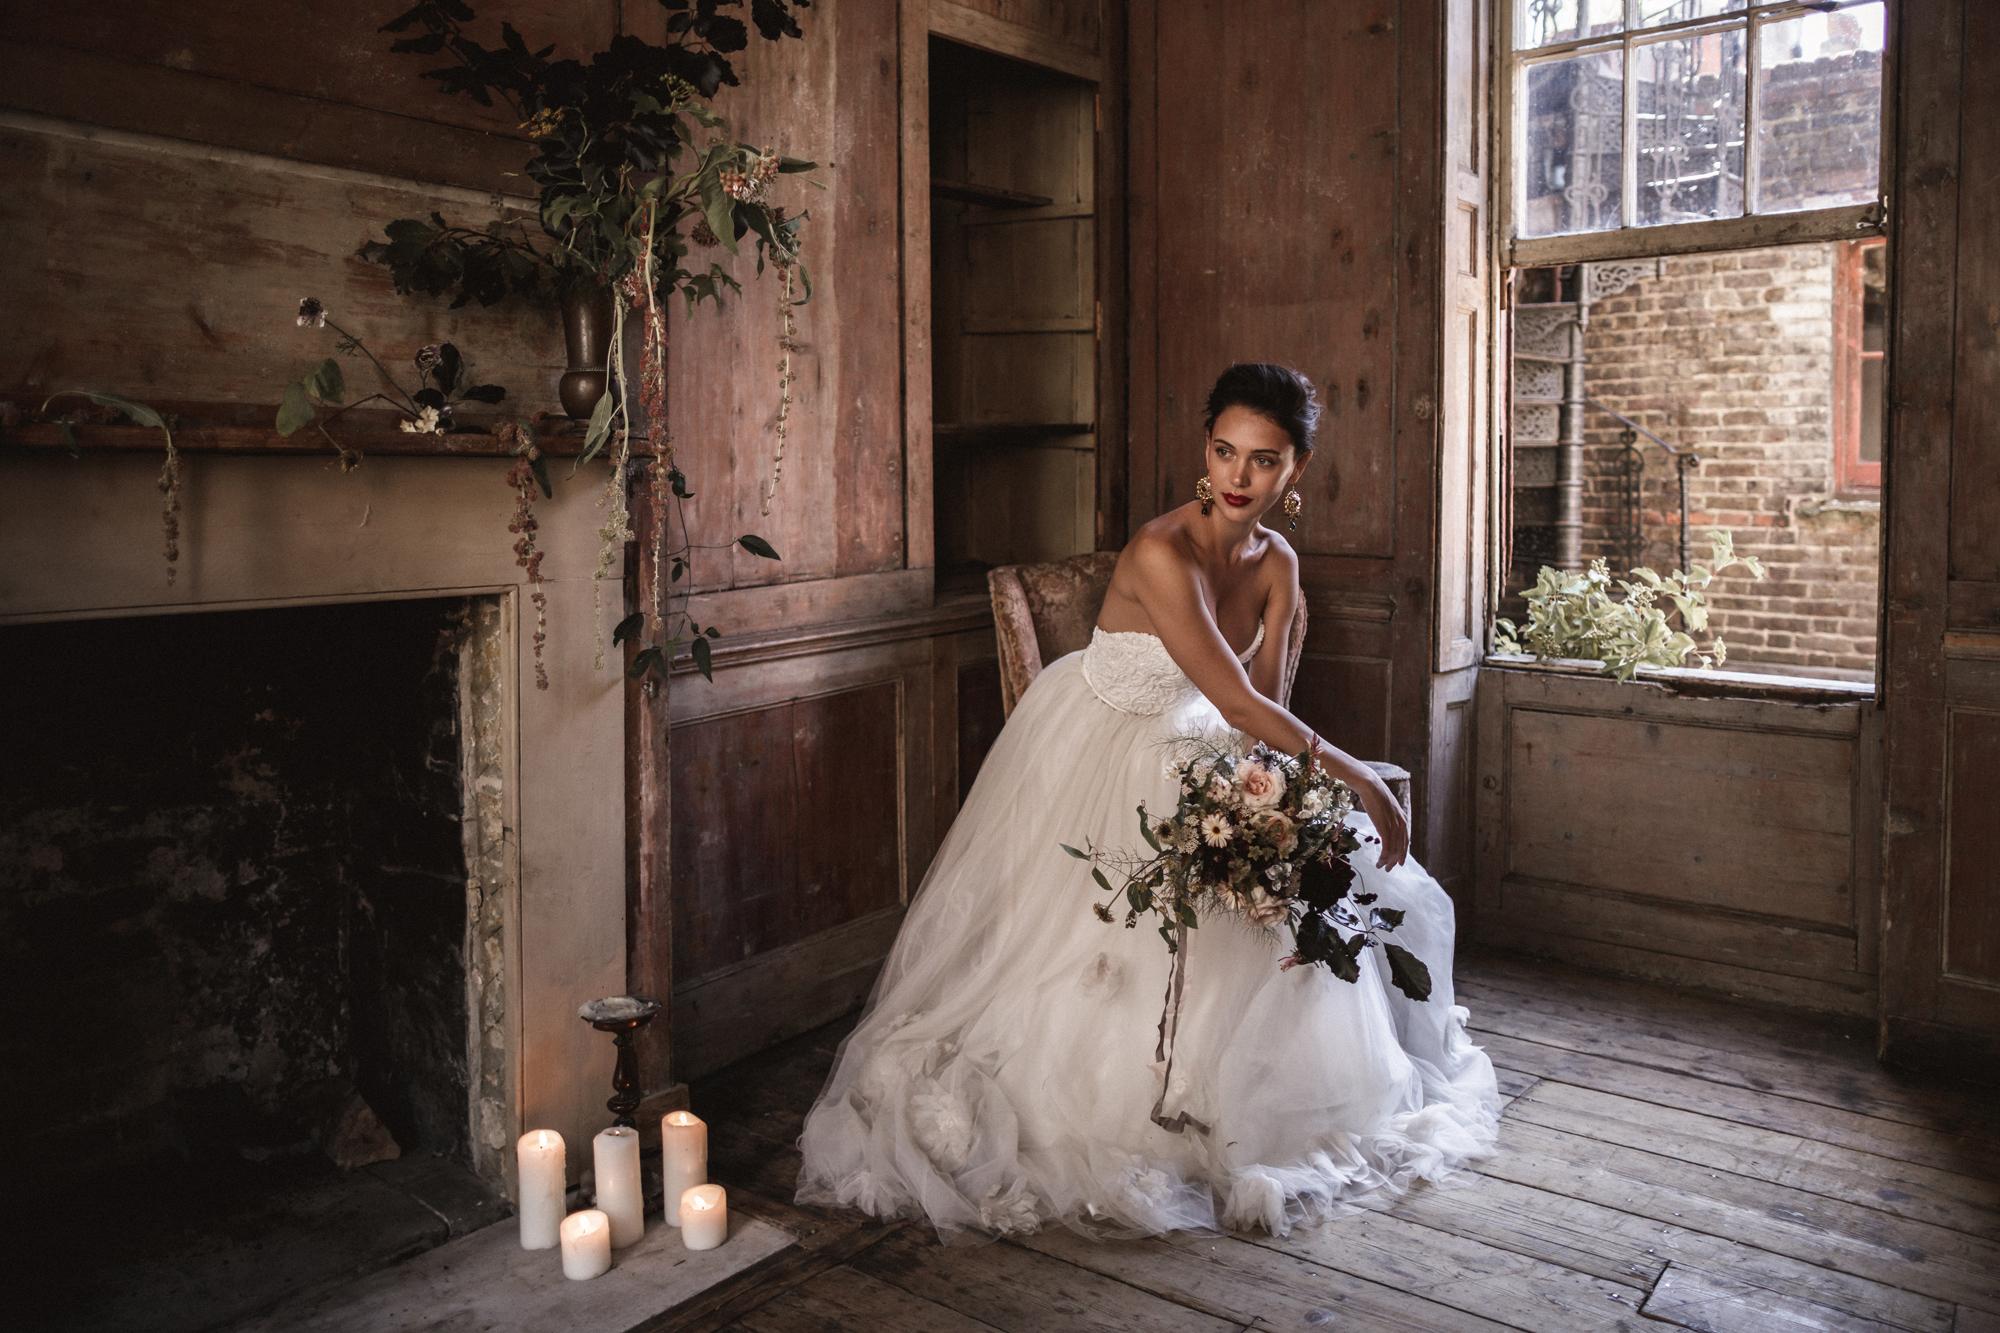 Stunning bridal inspiration shoot by Beatnik Bride and Benjamin Wheeler | Dress by Halfpenny London